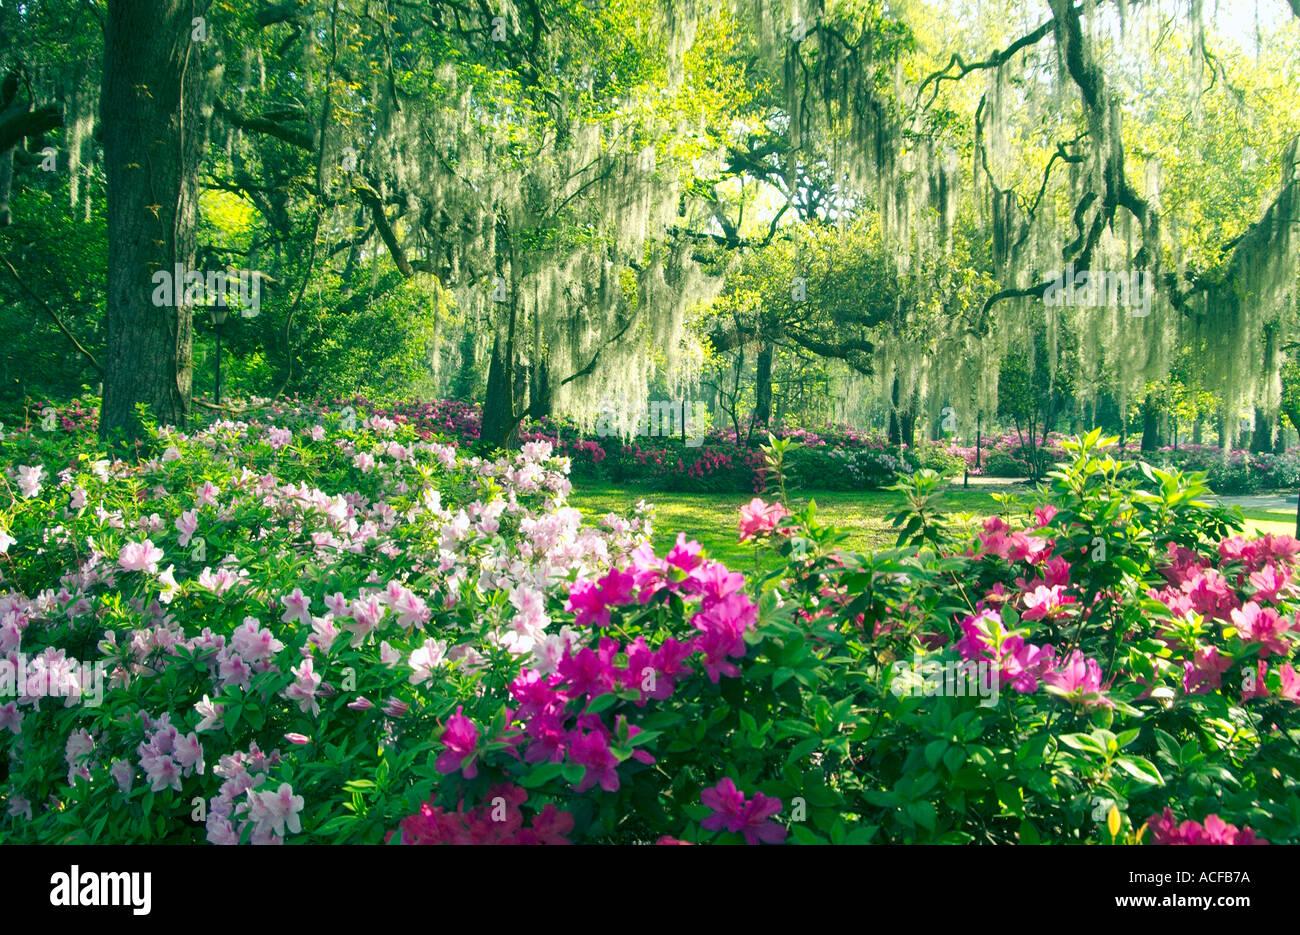 Azalea Blossoms And Spanish Moss In The Parks Of Savannah Georgia